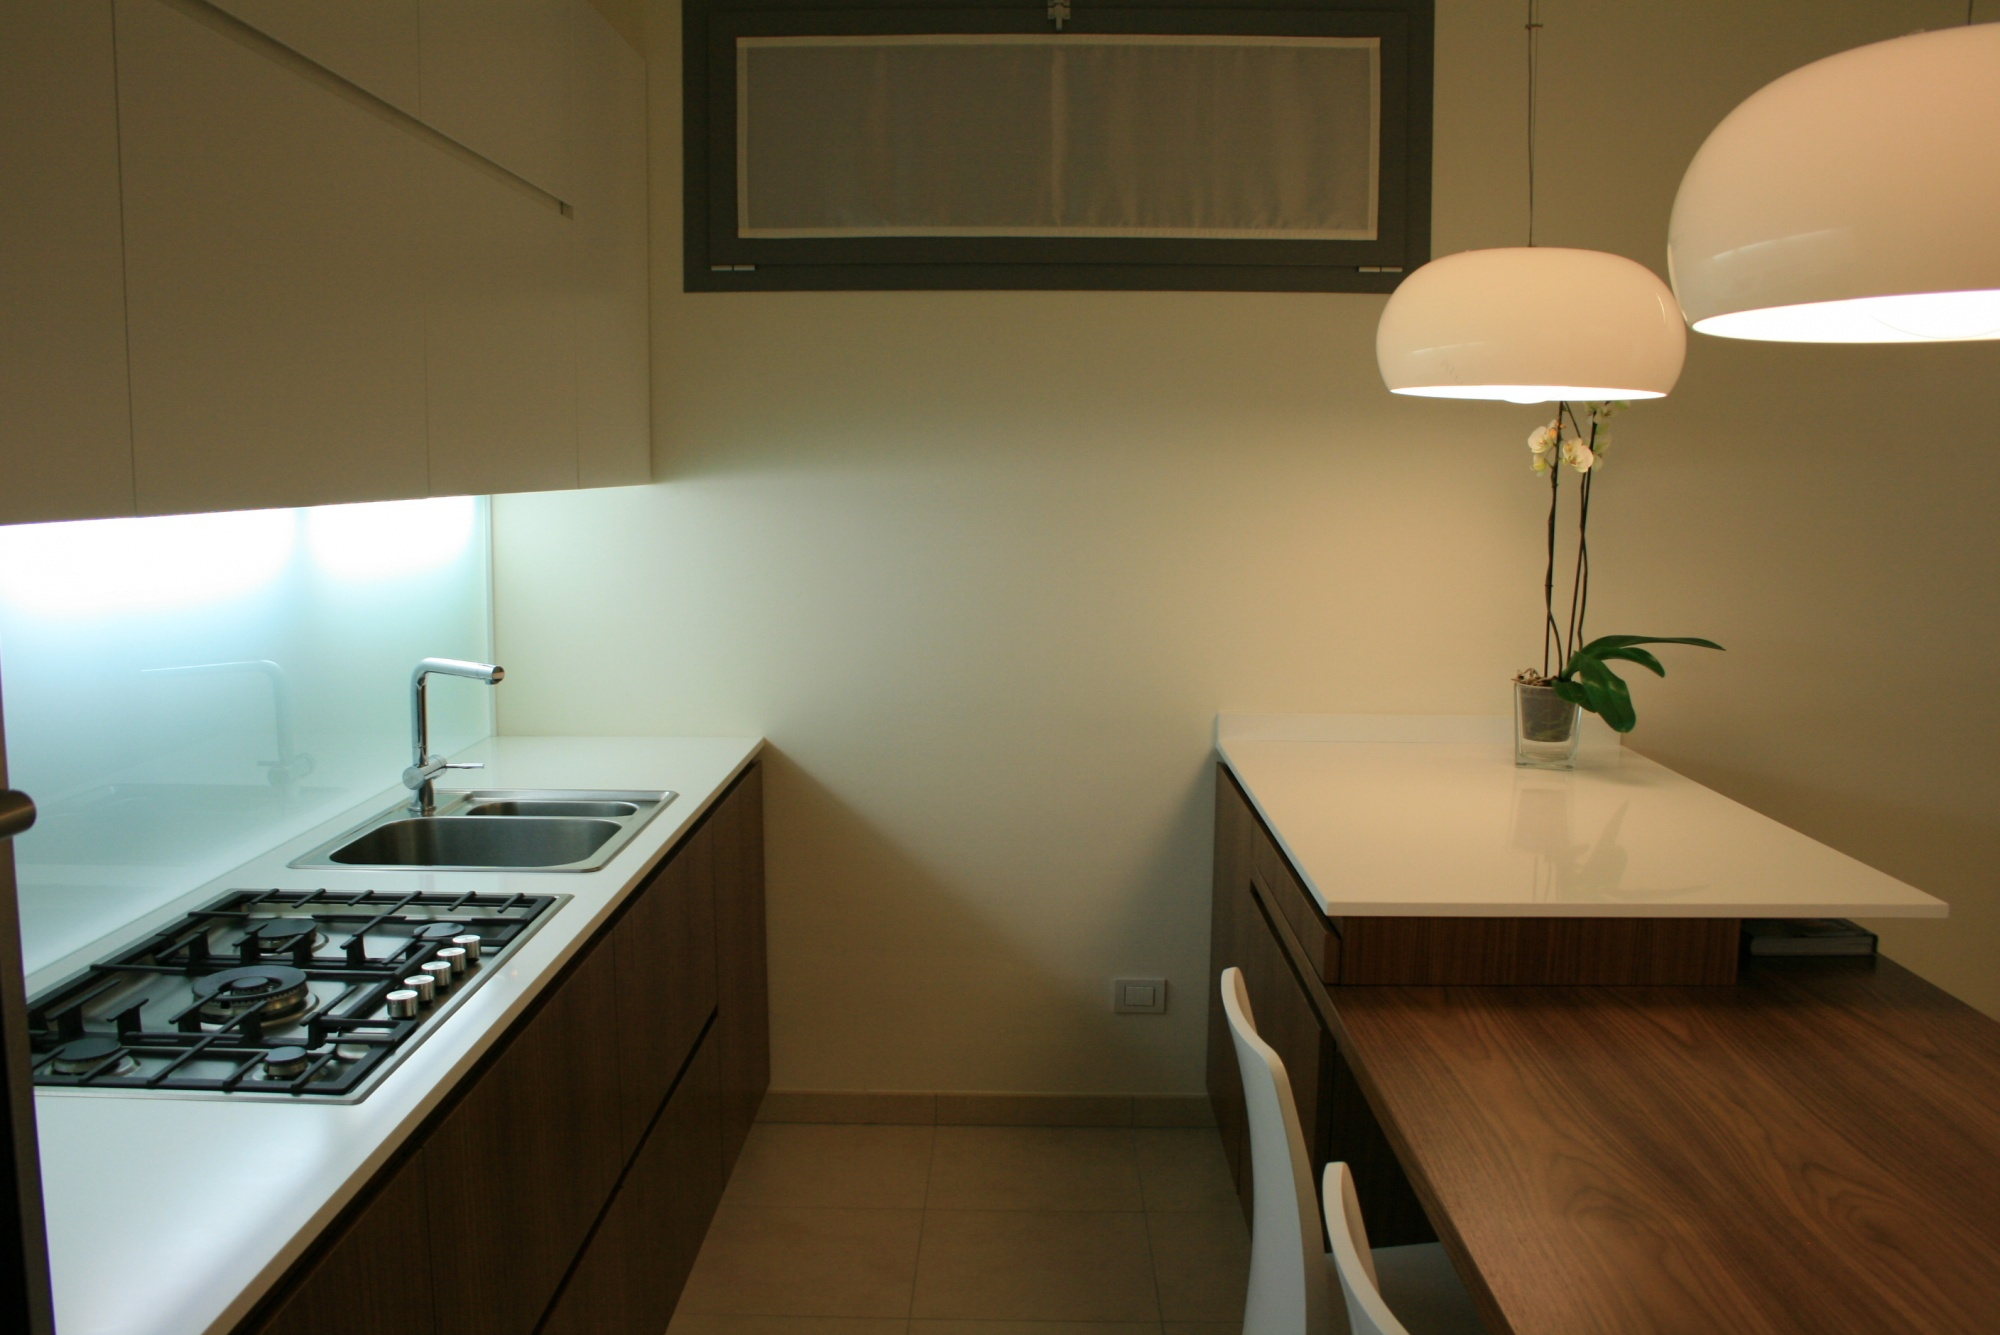 Cucina moderna con penisola in noce canaletto a - Cucina bianca e noce ...